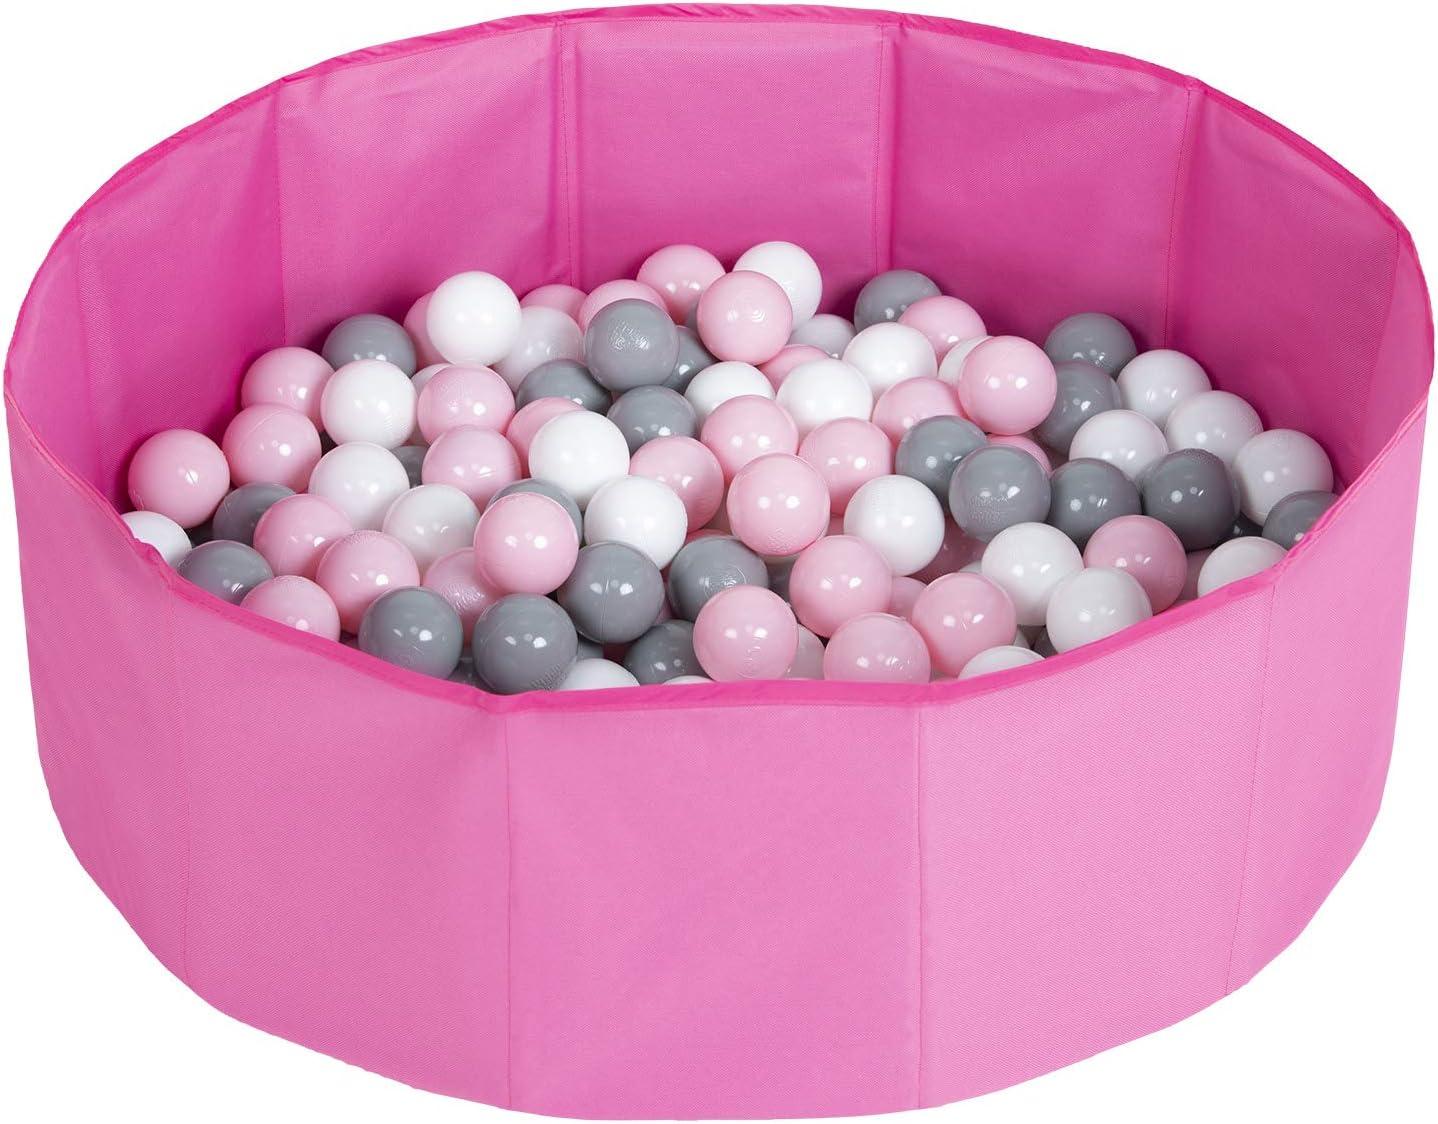 Selonis Piscina Plegable con Bolas Coloridas De 100 Bolas NZ-78-BLUE, Rosa:Blanco/Gris/Rosa Claro